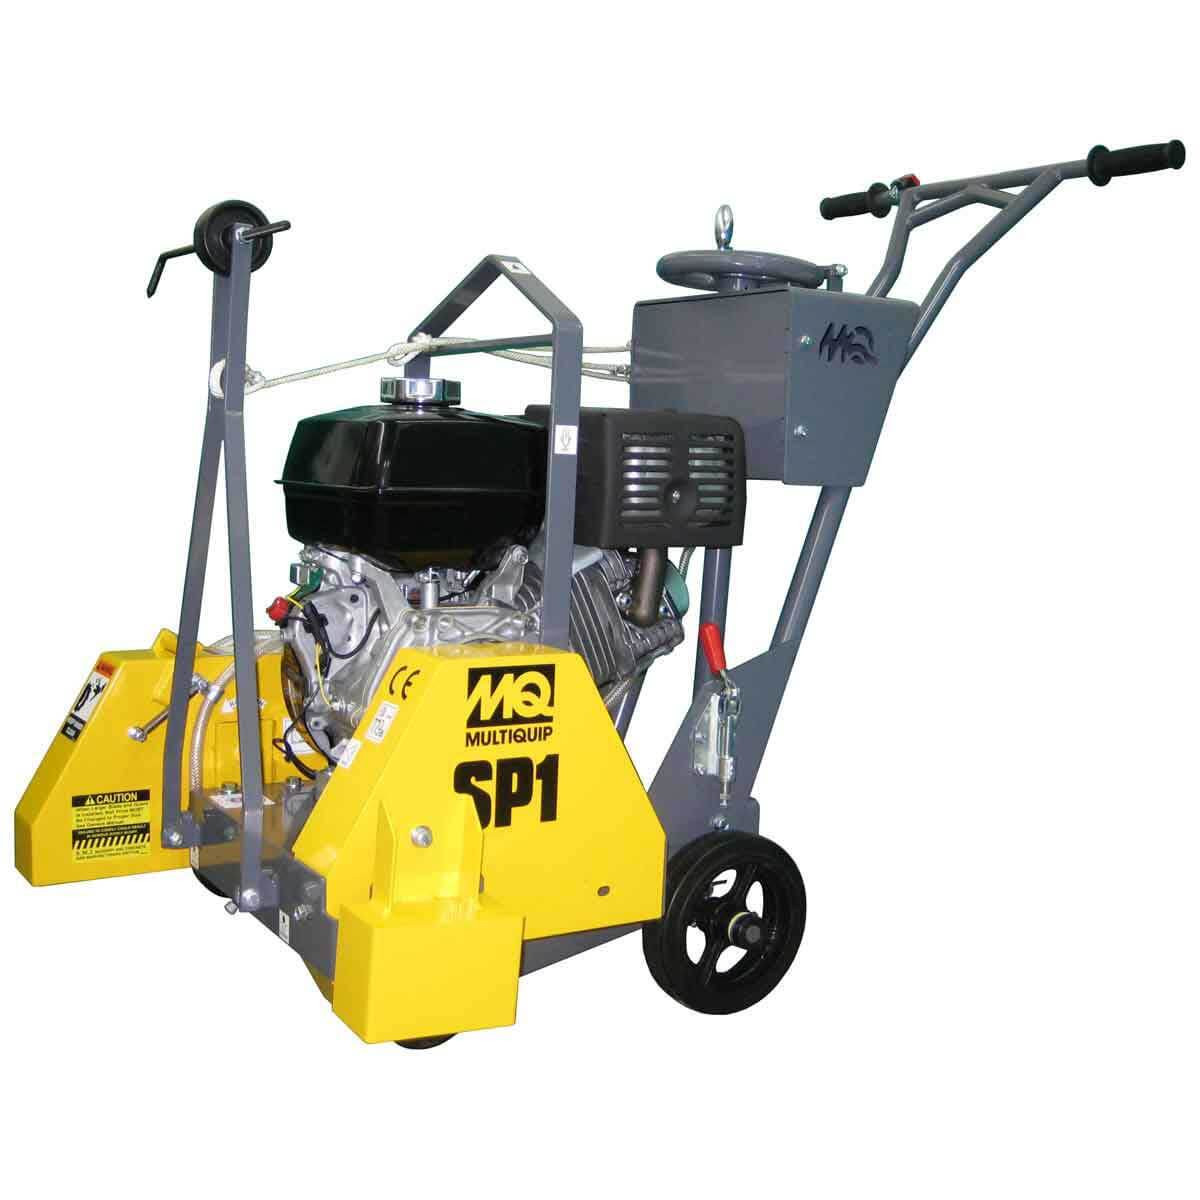 Multiquip SP118 gas Push saw